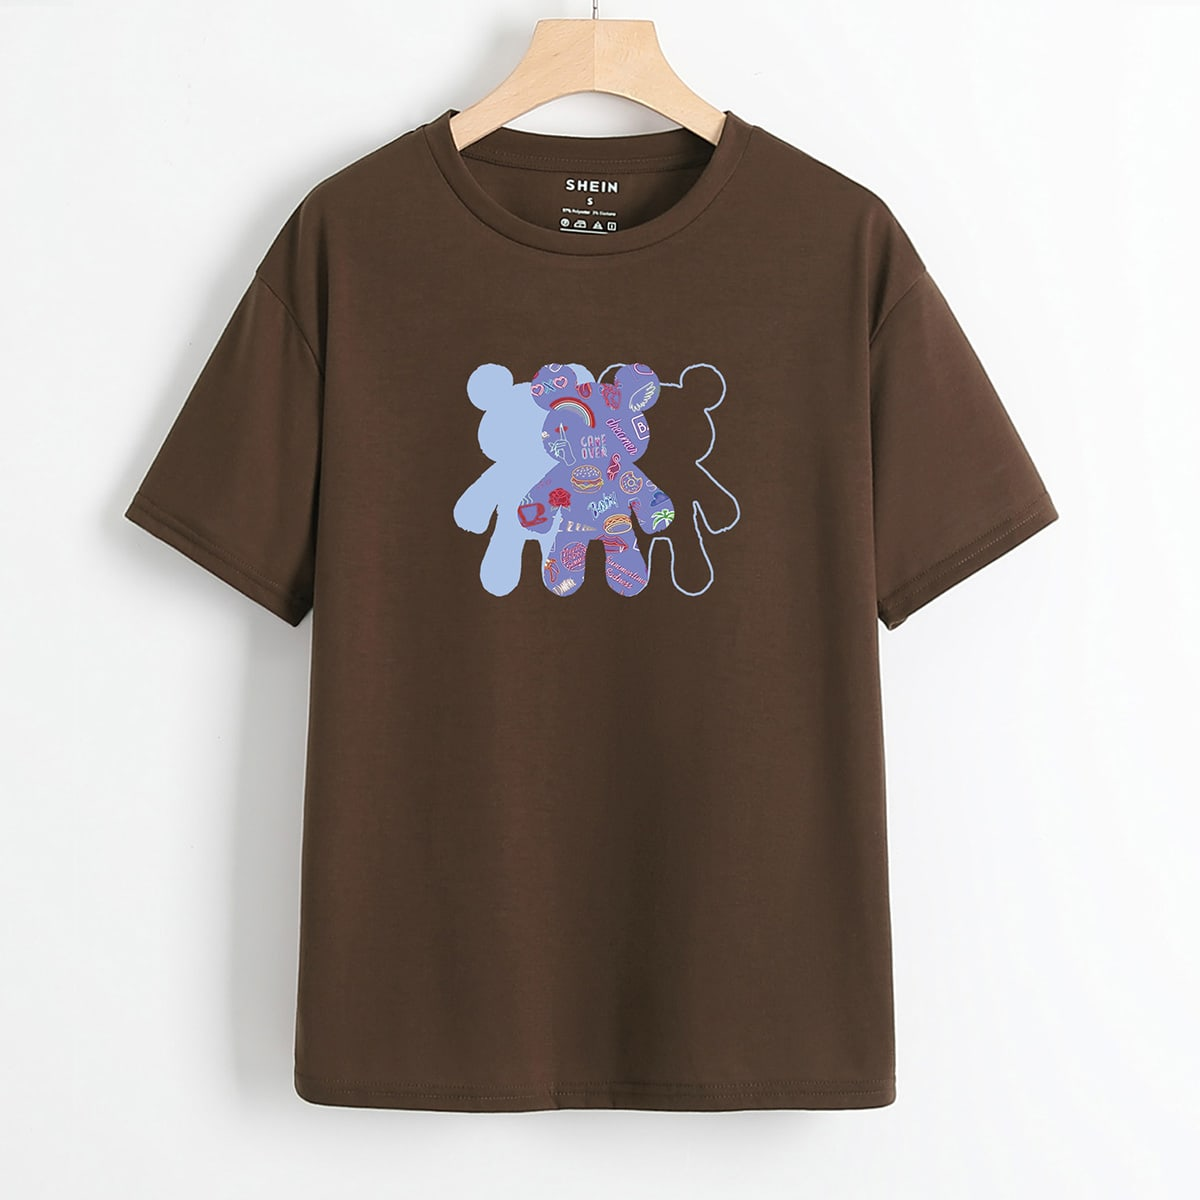 Cartoon Bear Graphic Short Sleeve Tee, SHEIN  - buy with discount